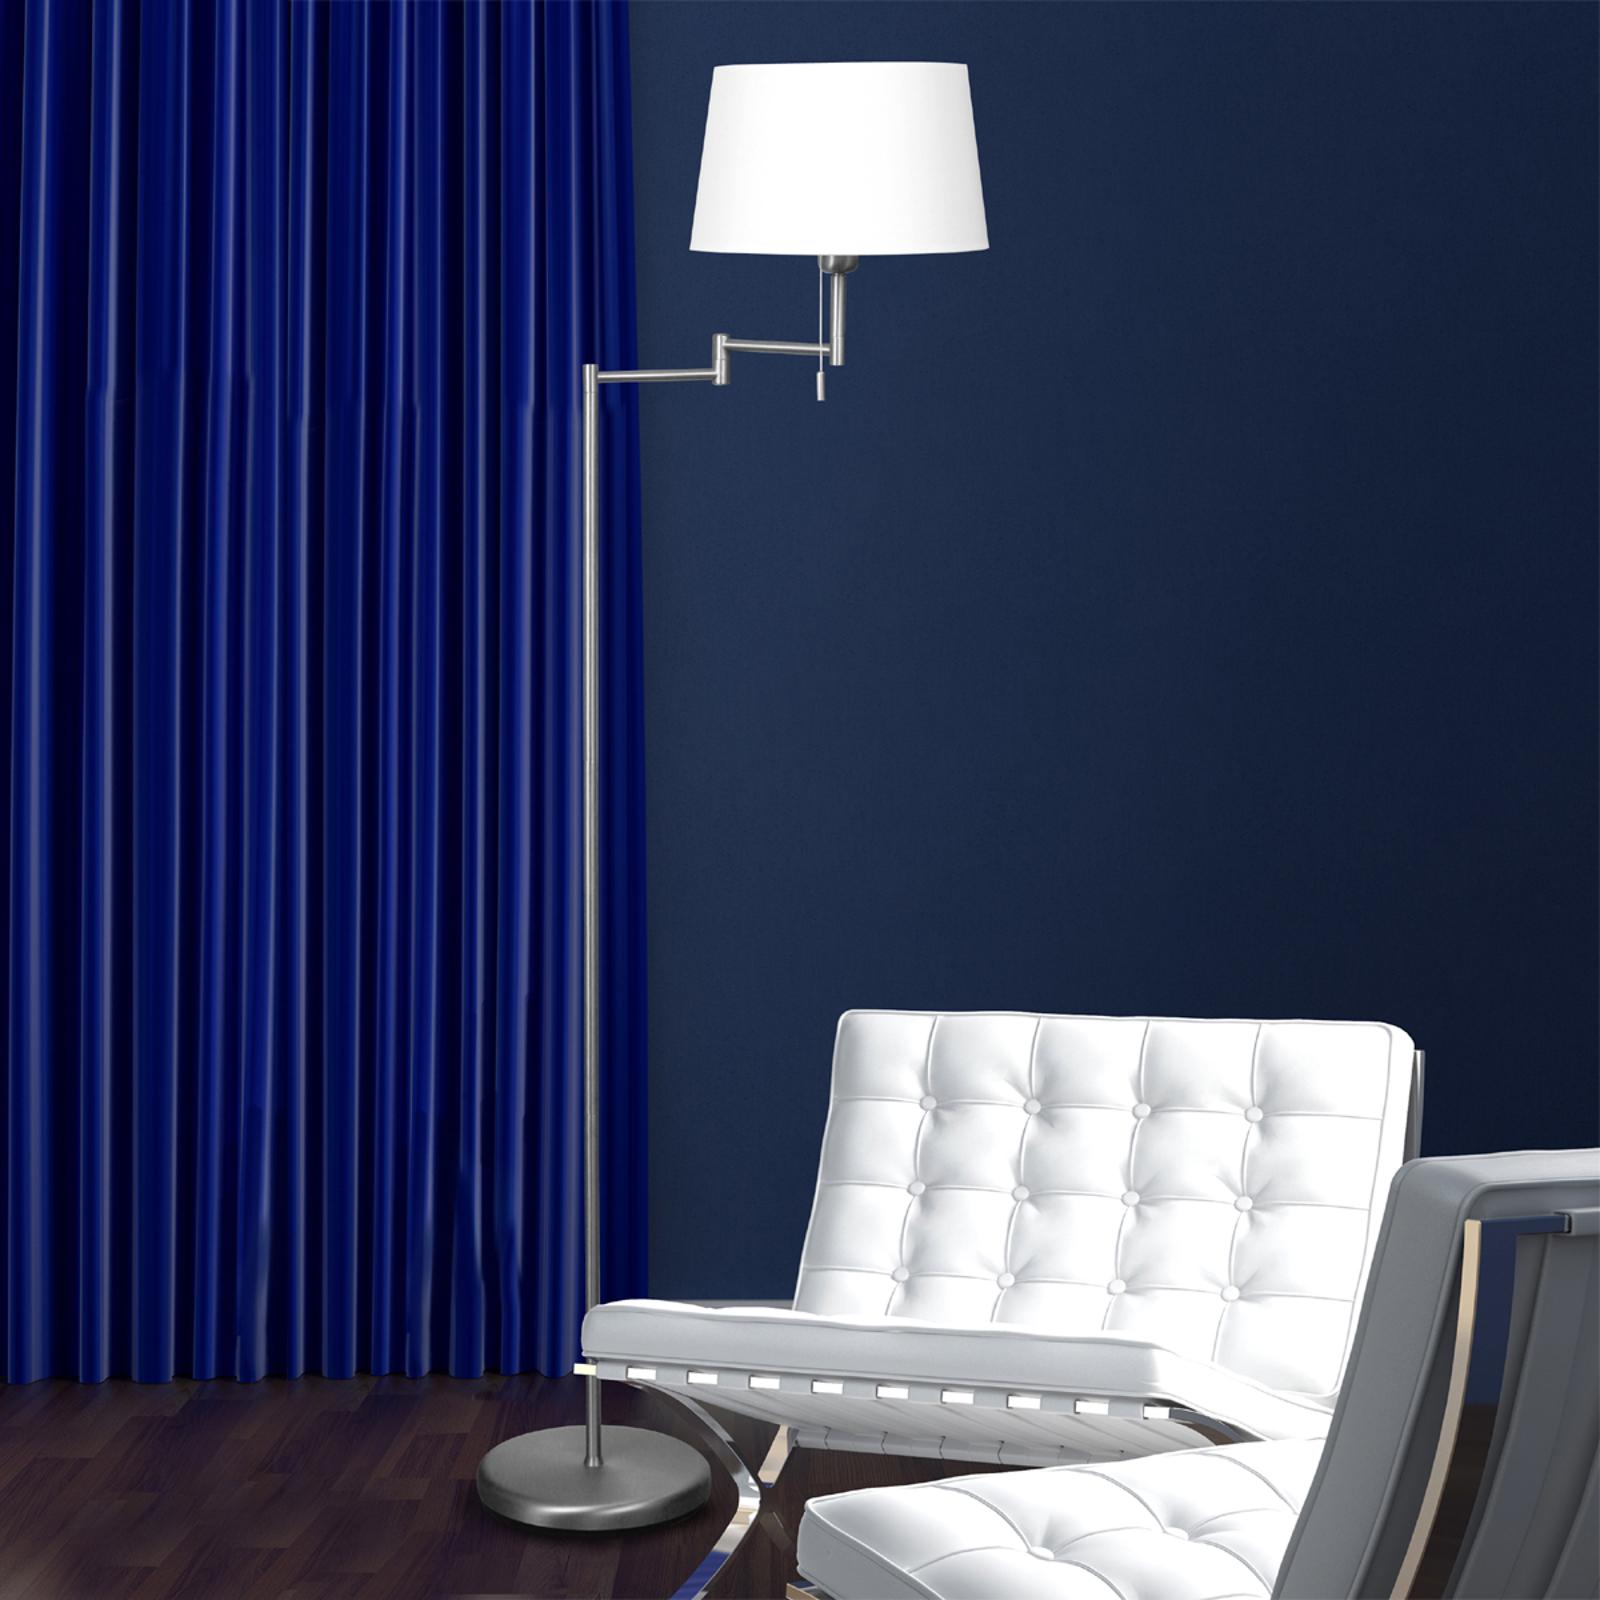 Srebrna lampa stojąca MEANDER z abażurem z tkaniny